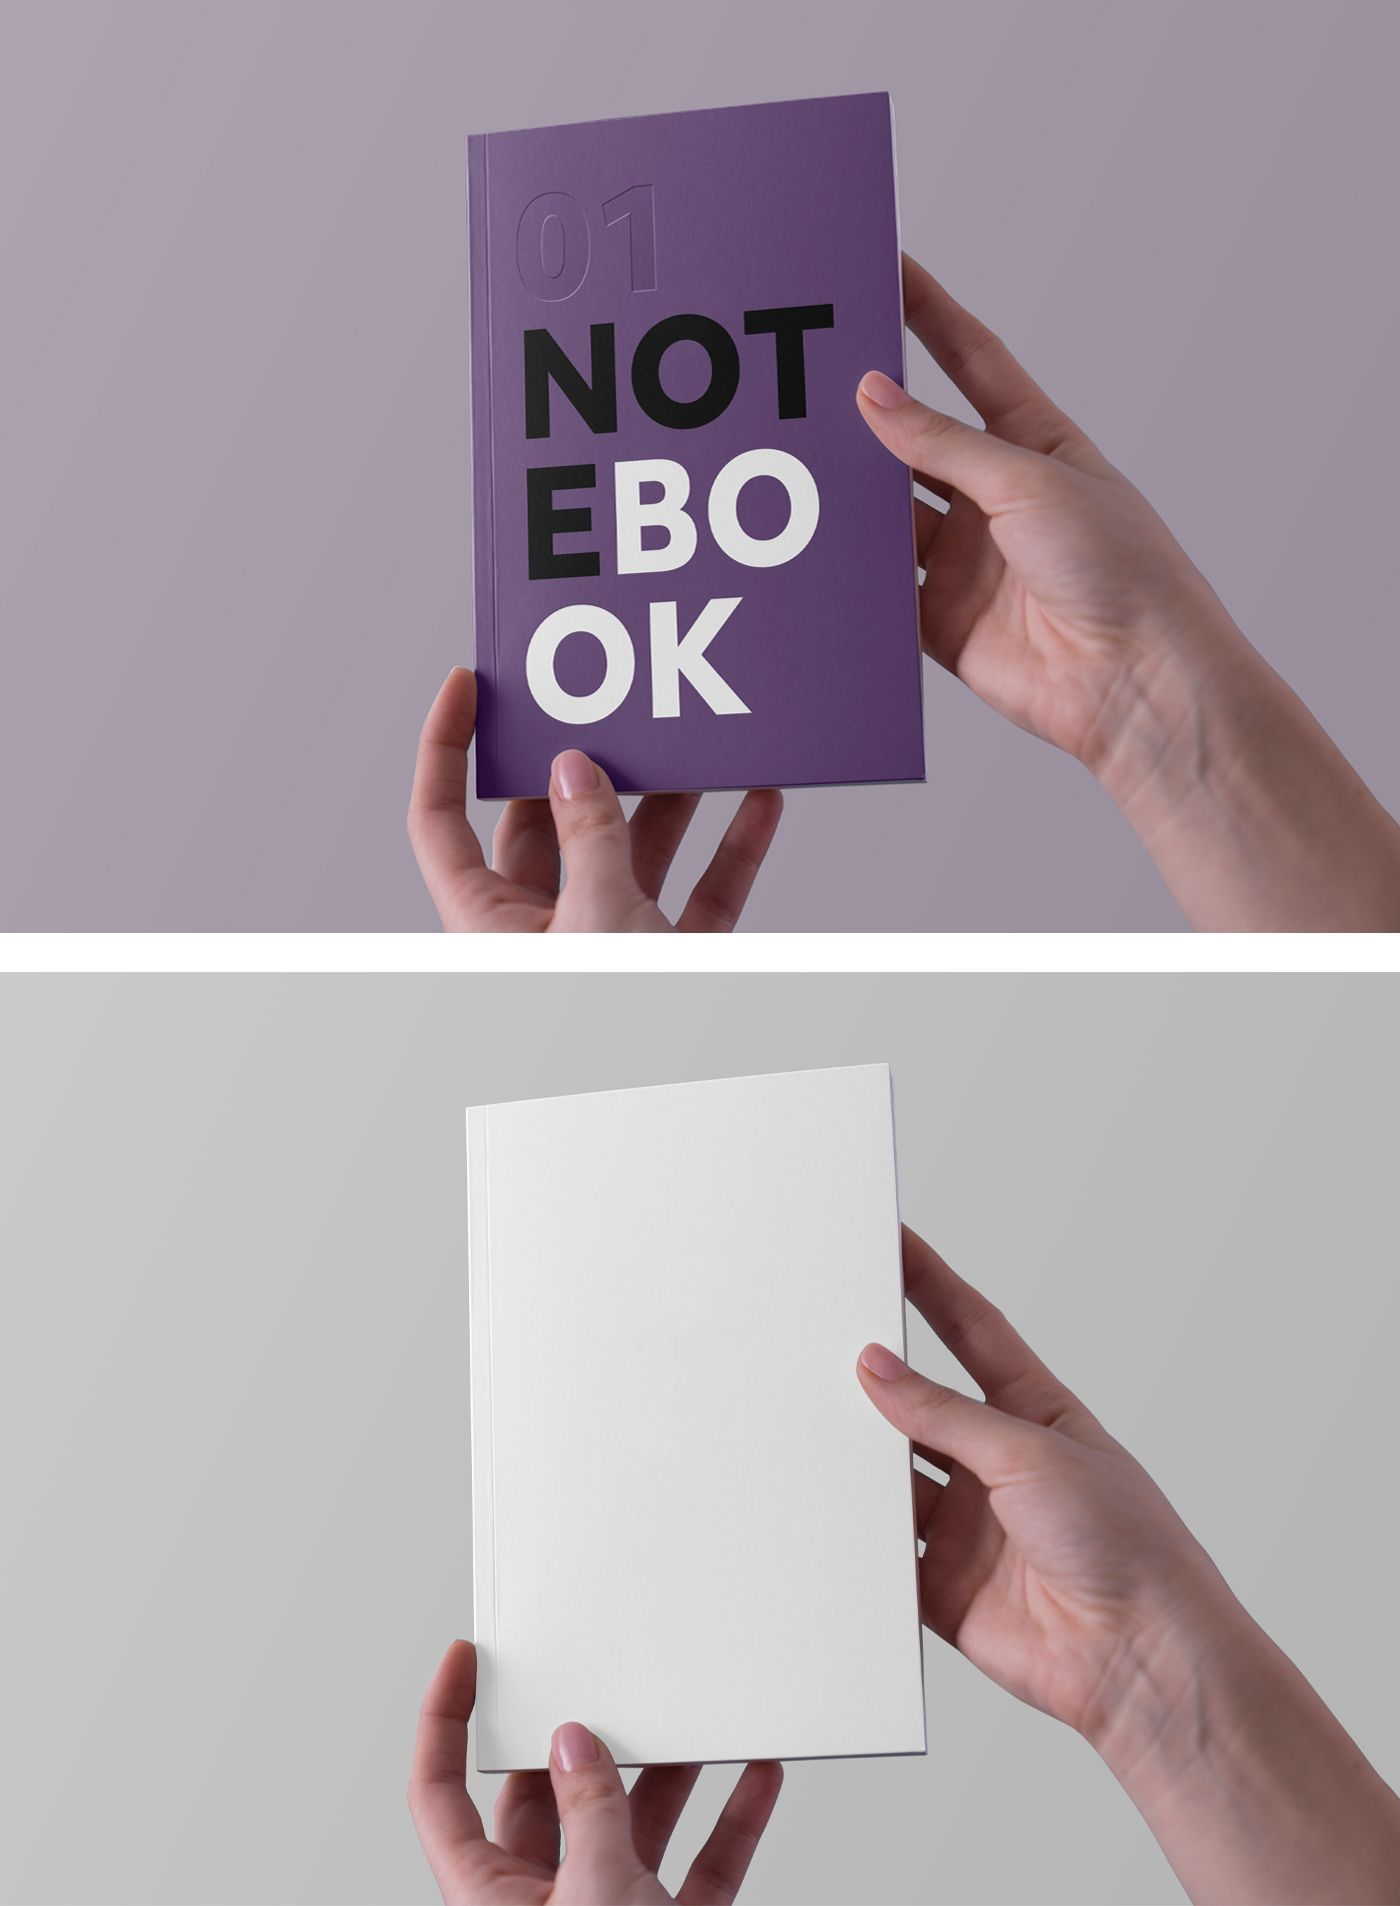 Hands Holding Notebook Mockup Graphic Design Freebies Design Freebie Free Mockup